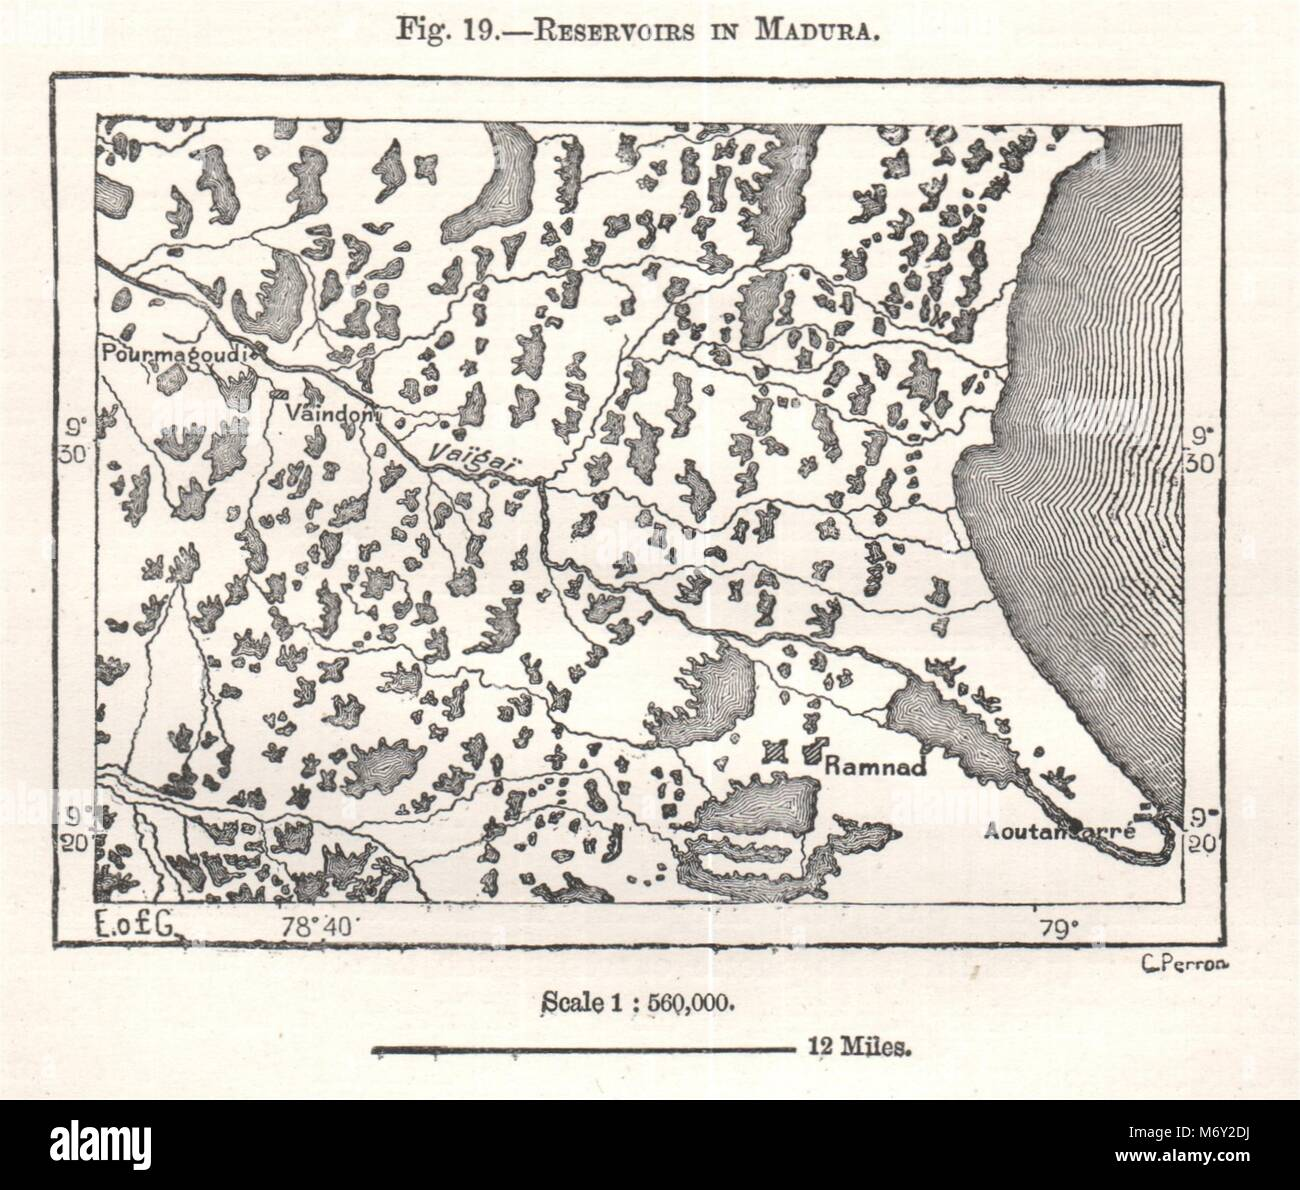 Reservoirs in Madurai. Atrangurai. India. Sketch map 1885 ... on uttaranchal india map, khammam india map, kolkota india map, char dham india map, andaman and nicobar islands india map, karimnagar india map, pondicherry india map, jamshedpur india map, nabha india map, vellore india map, sagar india map, neemrana india map, chennai india map, kanpur india map, balasore india map, kanker india map, hyderabad india map, bikaner india map, ludhiana india map, kanchi india map,